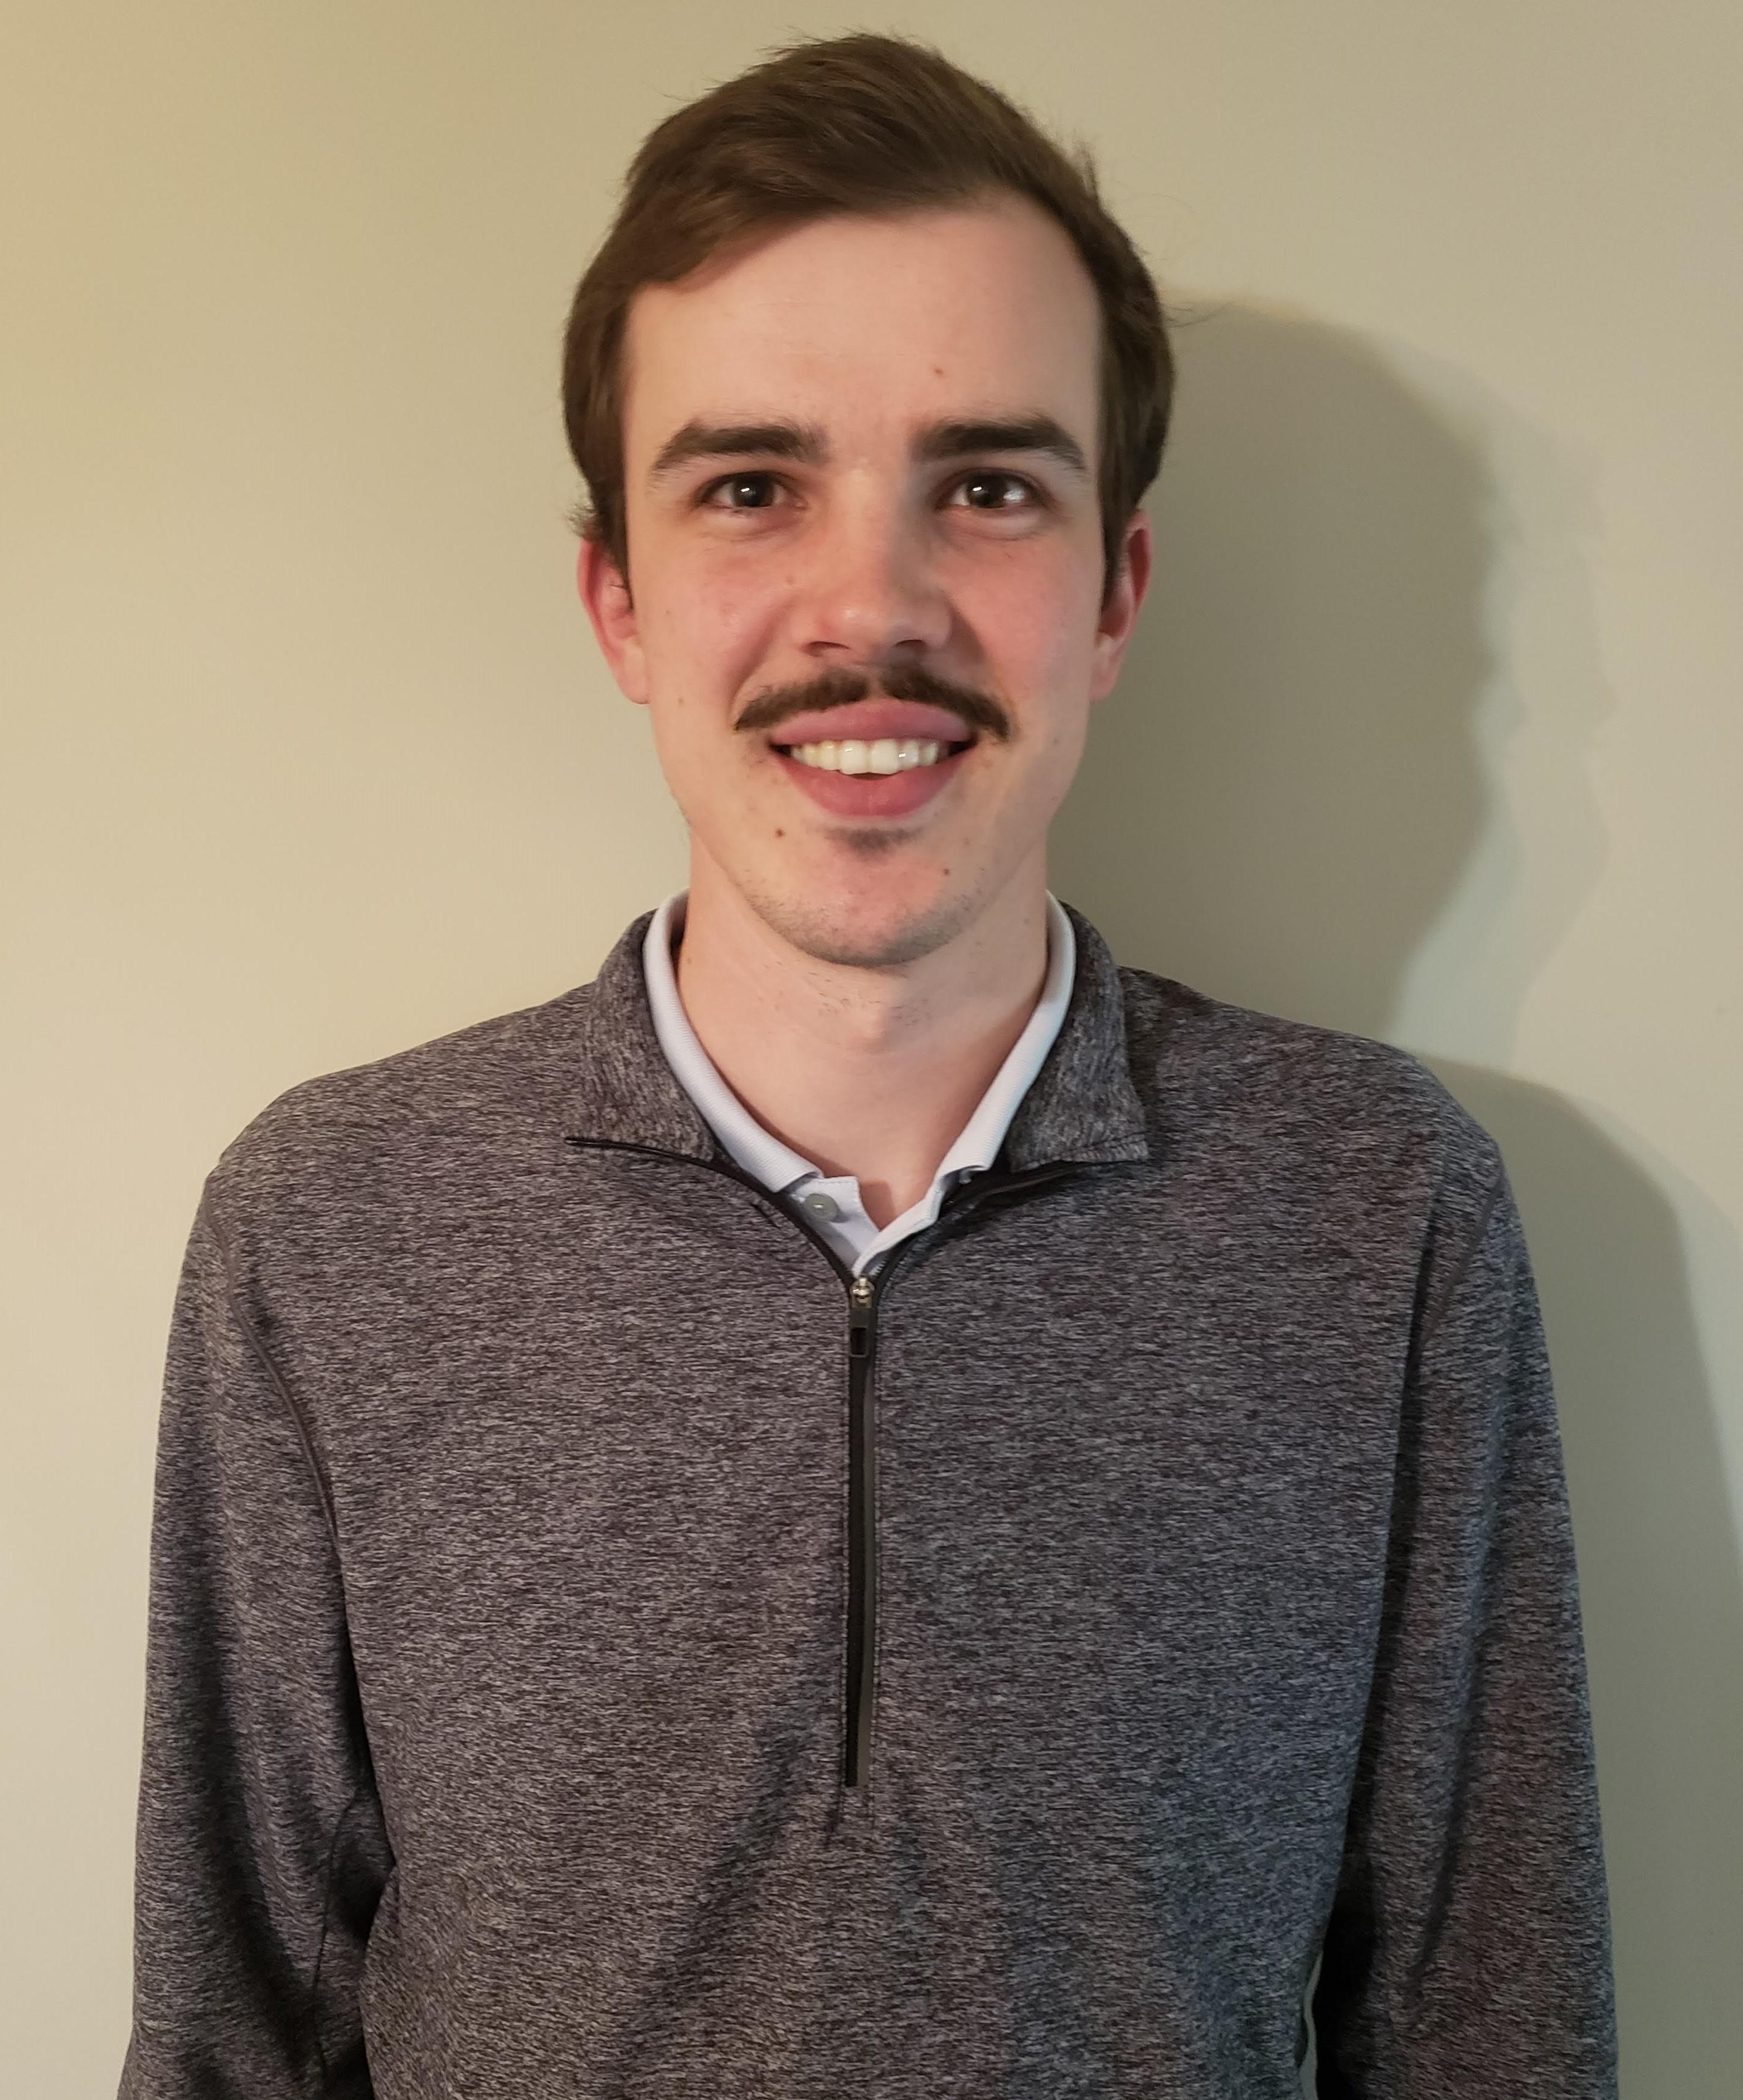 Headshot of Justin McKague